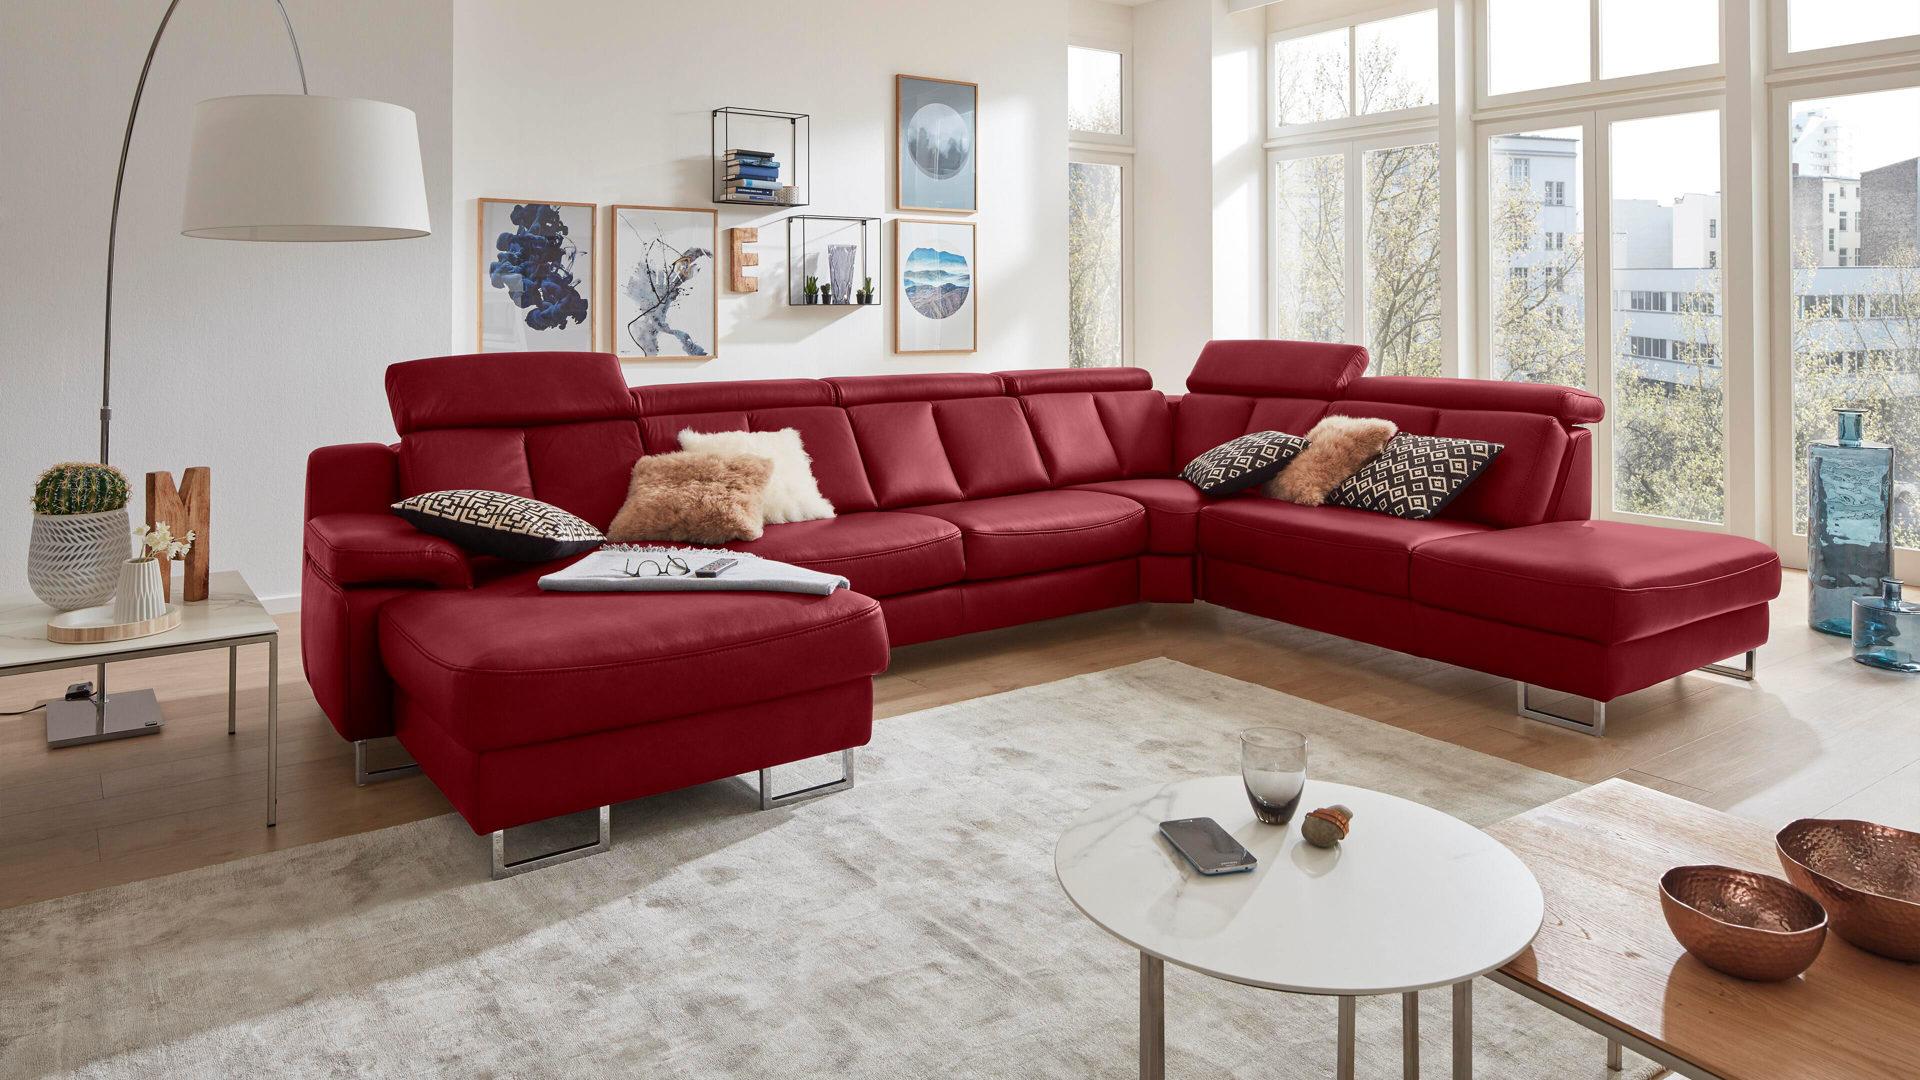 Interliving Sofa Serie 4050 Wohnlandschaft Rotes Longlife Leder Cloudy Red Chromfusse Stellflache Ca 368 X 261 Cm